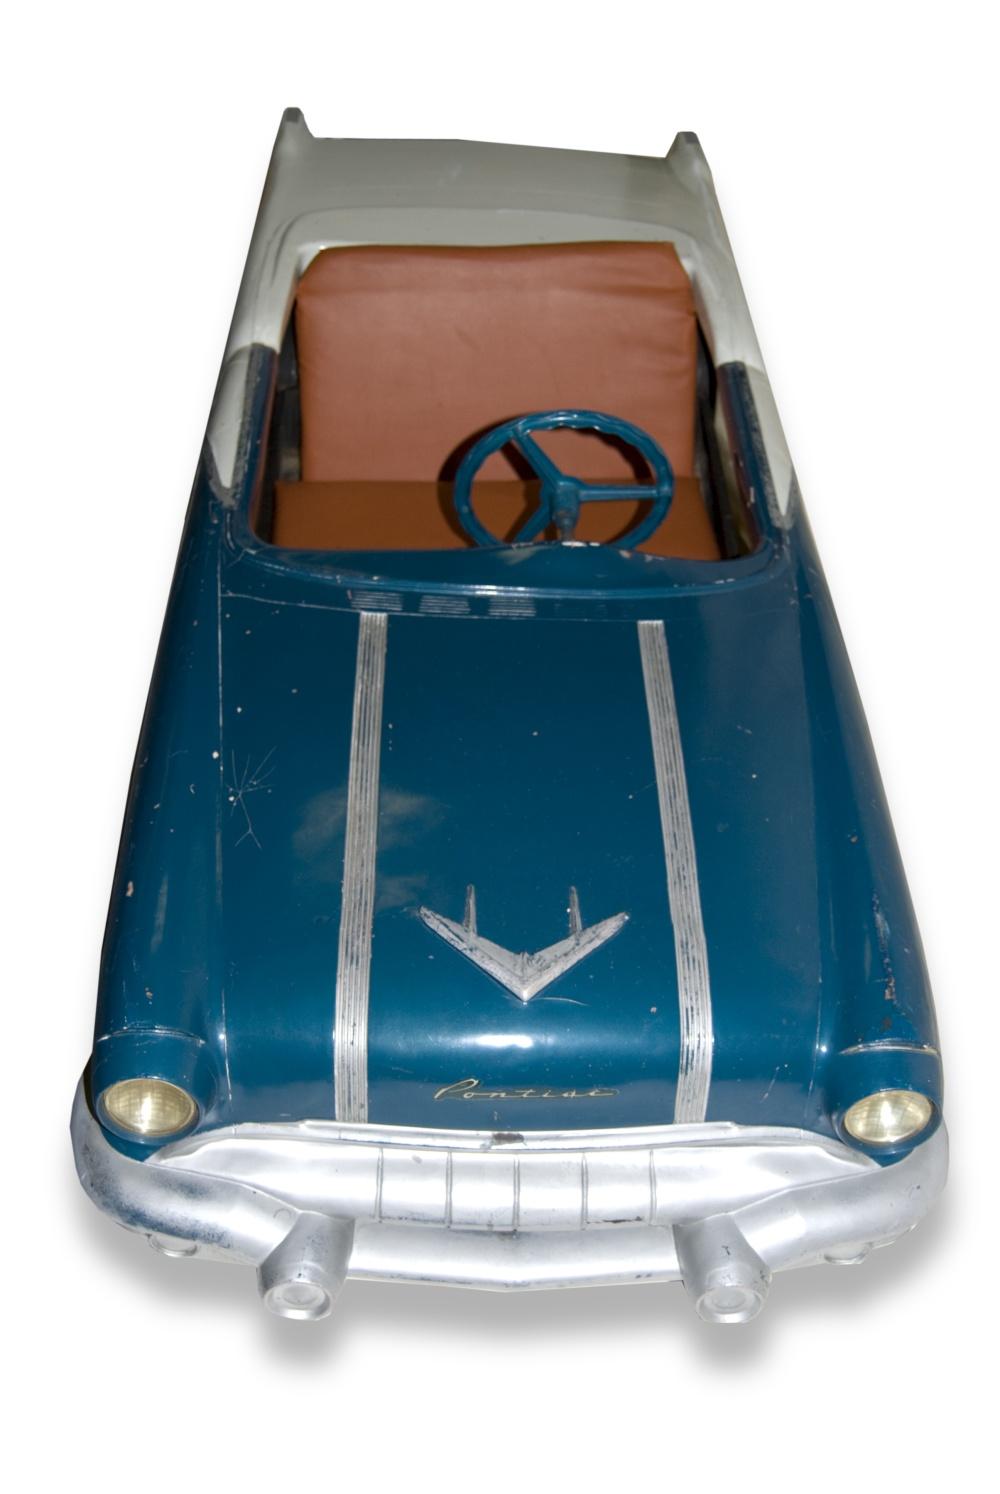 Pontiac on Adult Size Pedal Cars